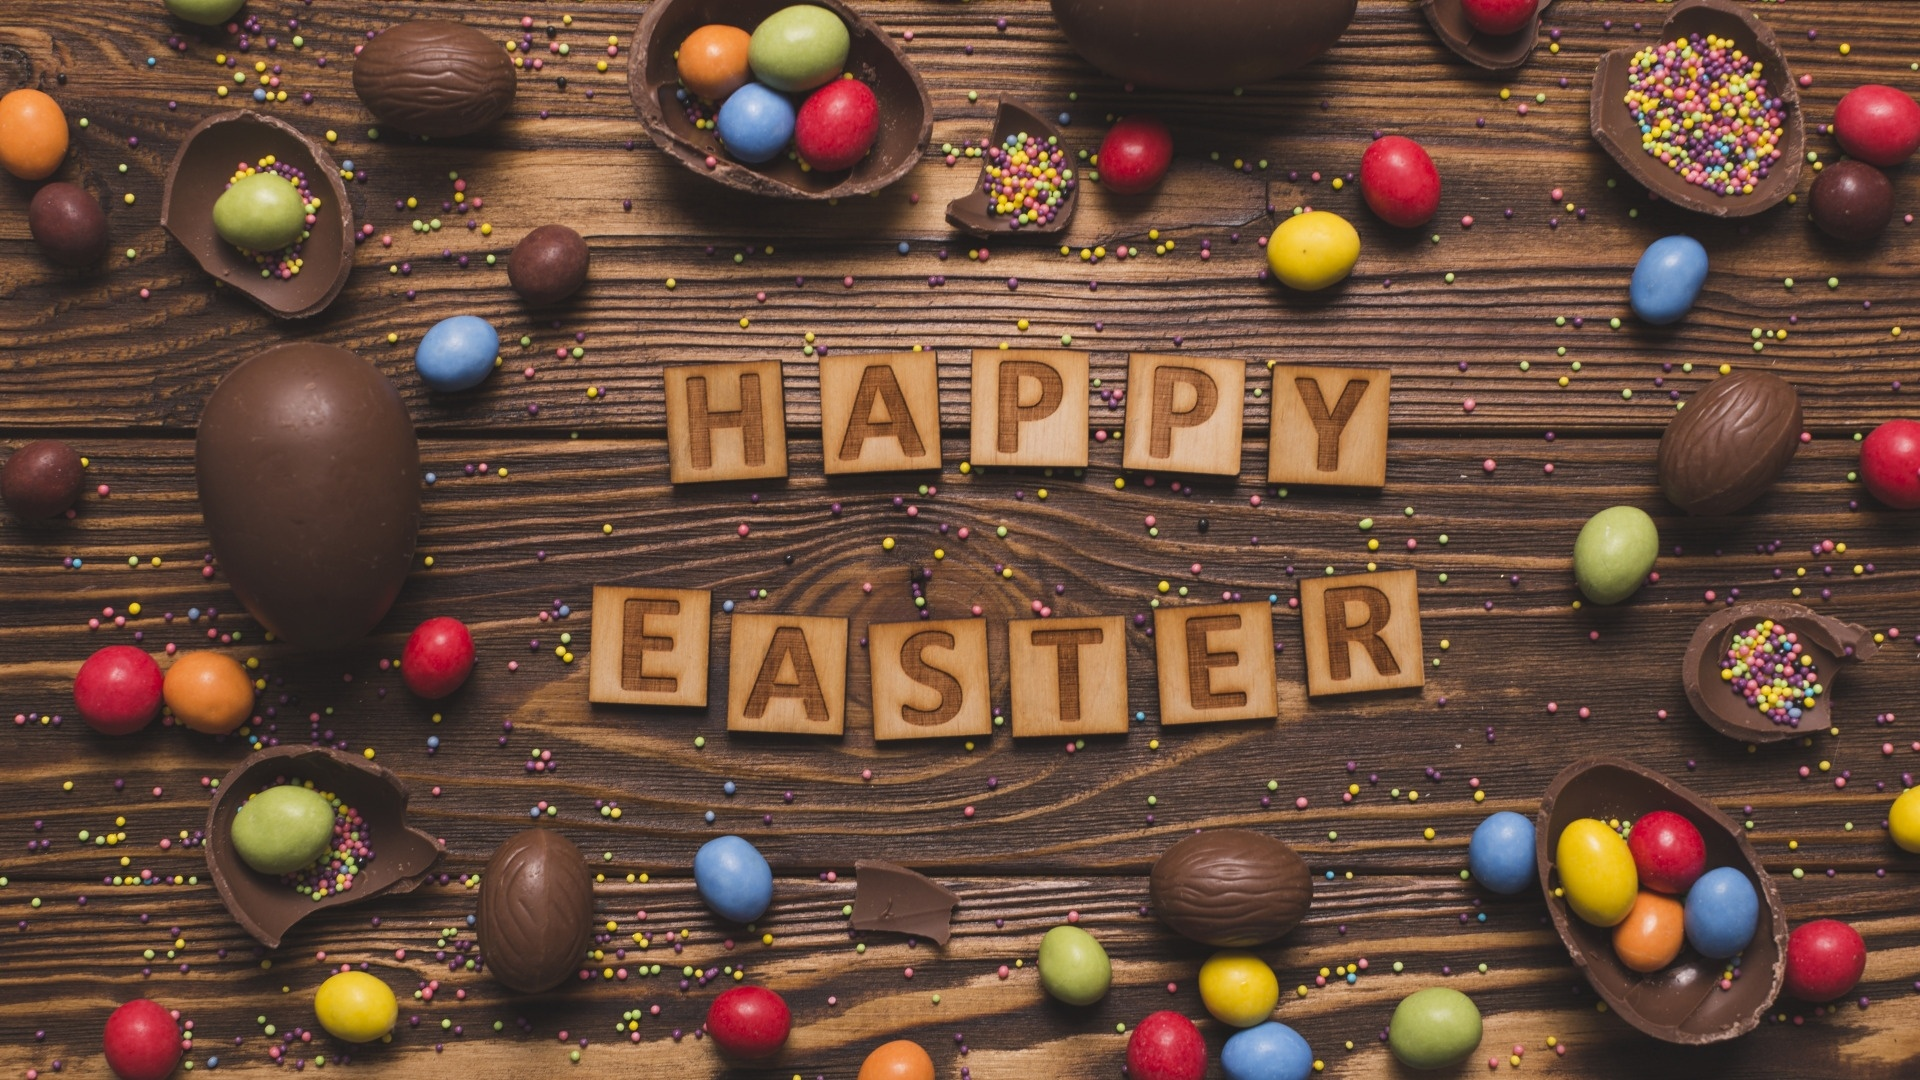 Happy Easter desktop wallpaper hd